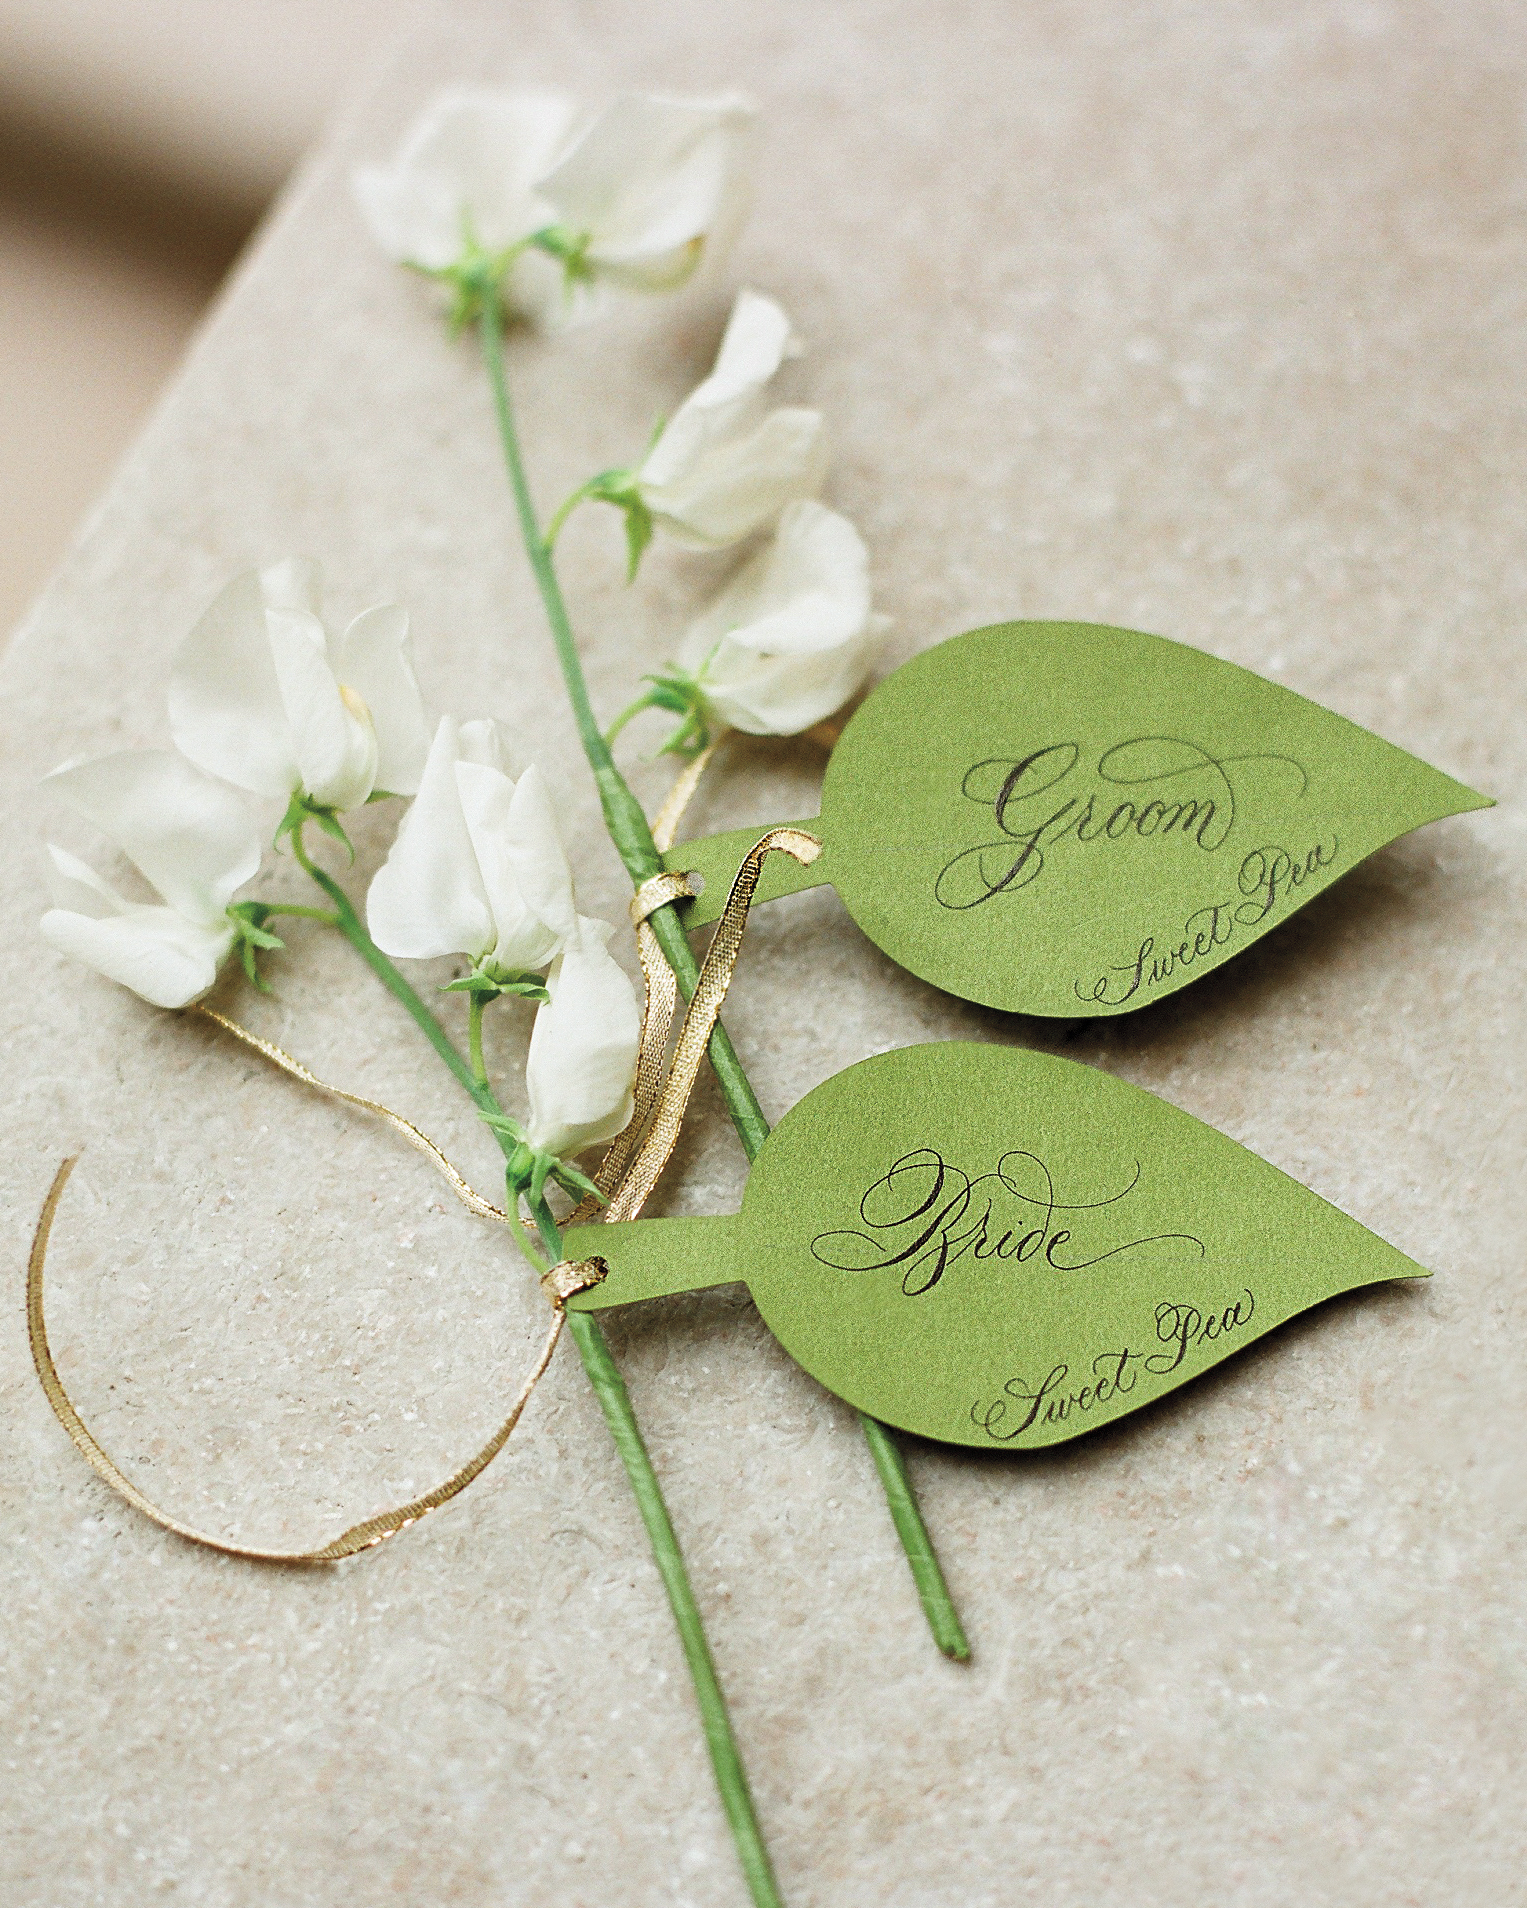 melton-wagner-escort-cards-mwds109373.jpg